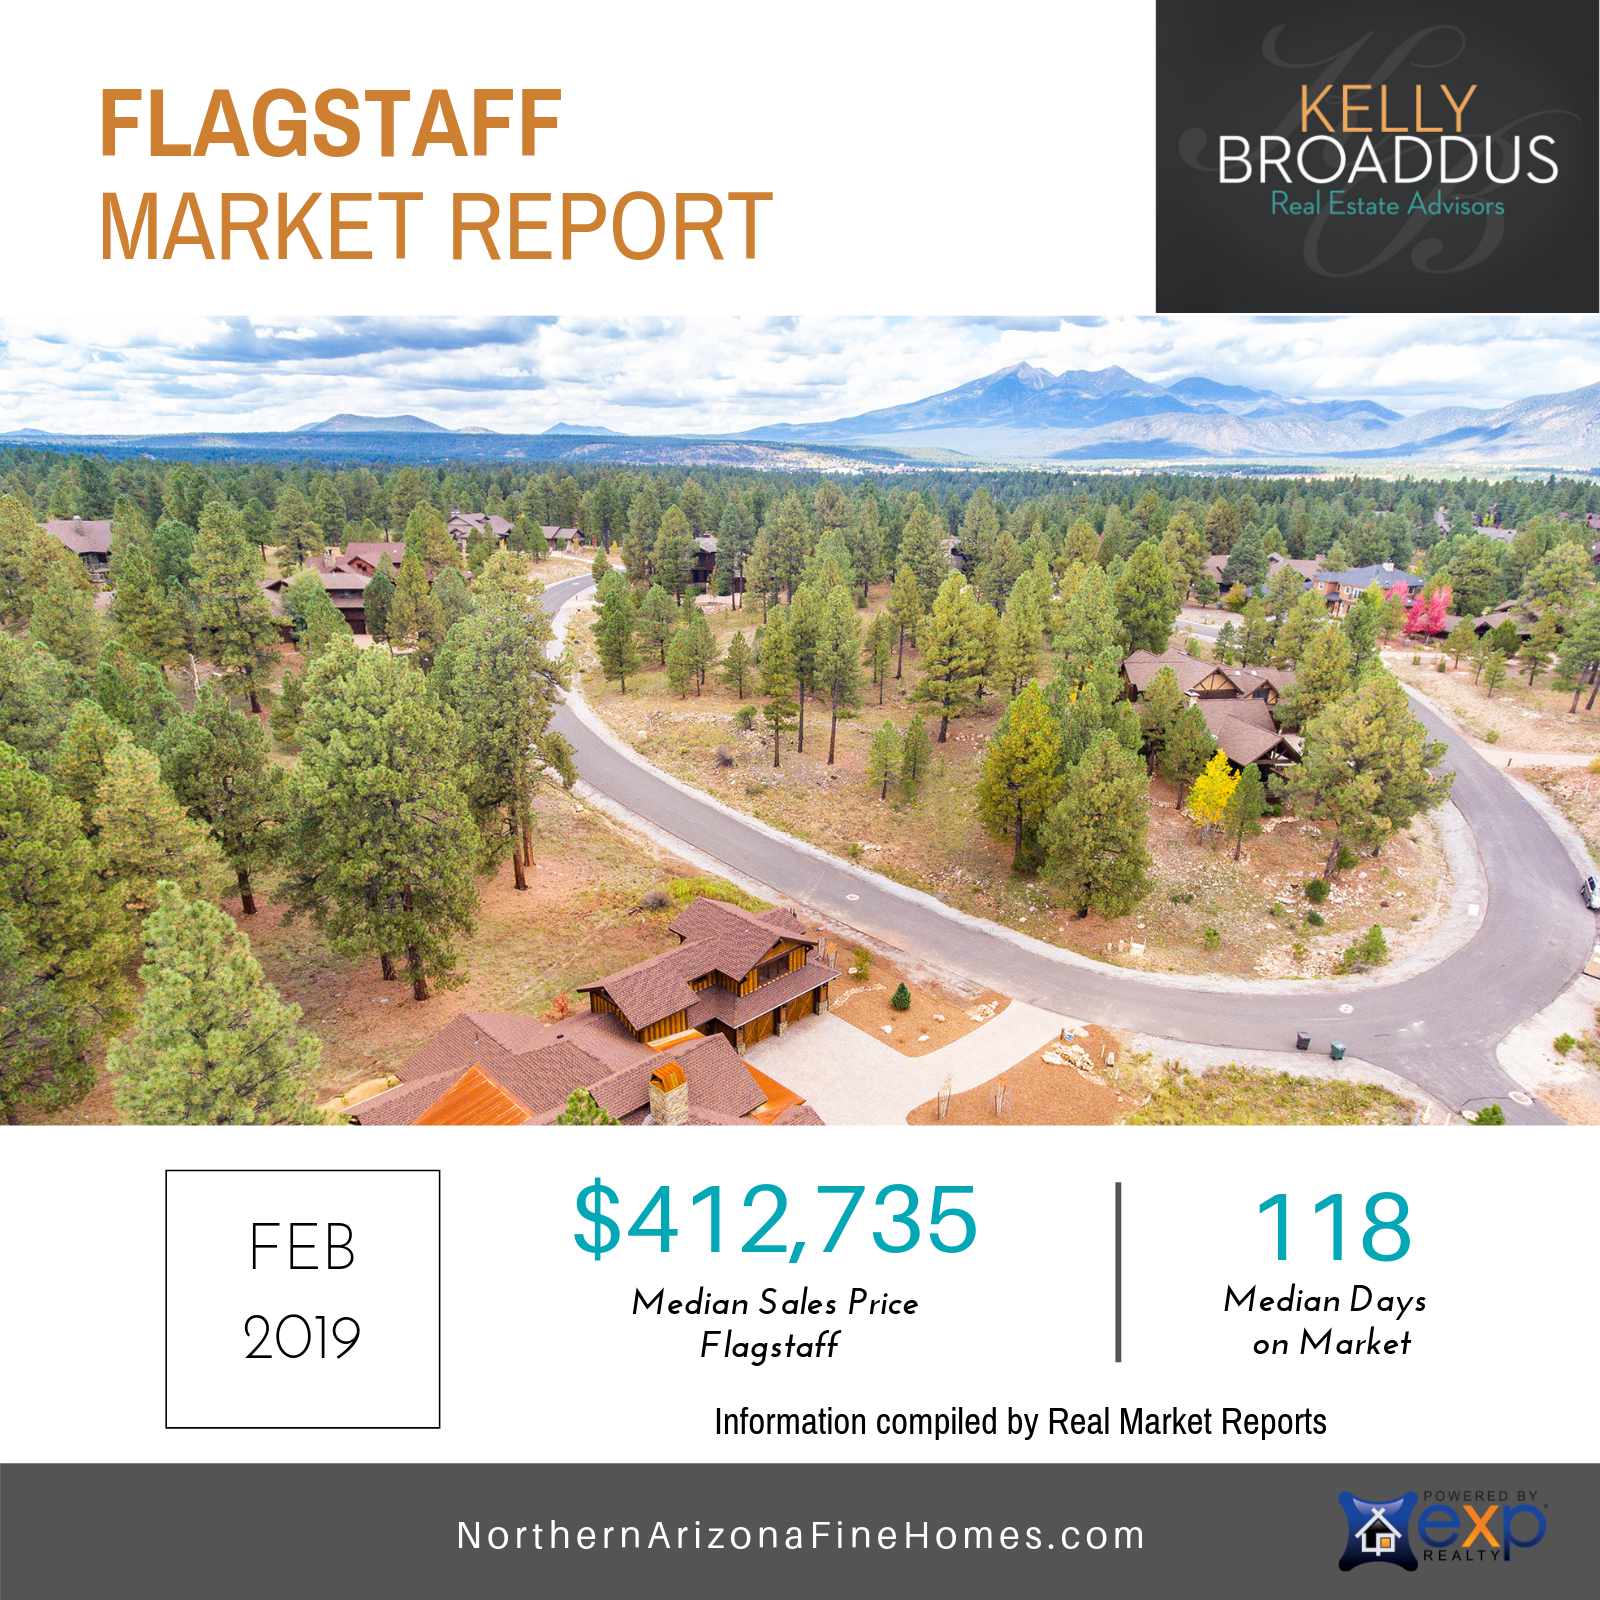 February 2019 Flagstaff Market Statistics